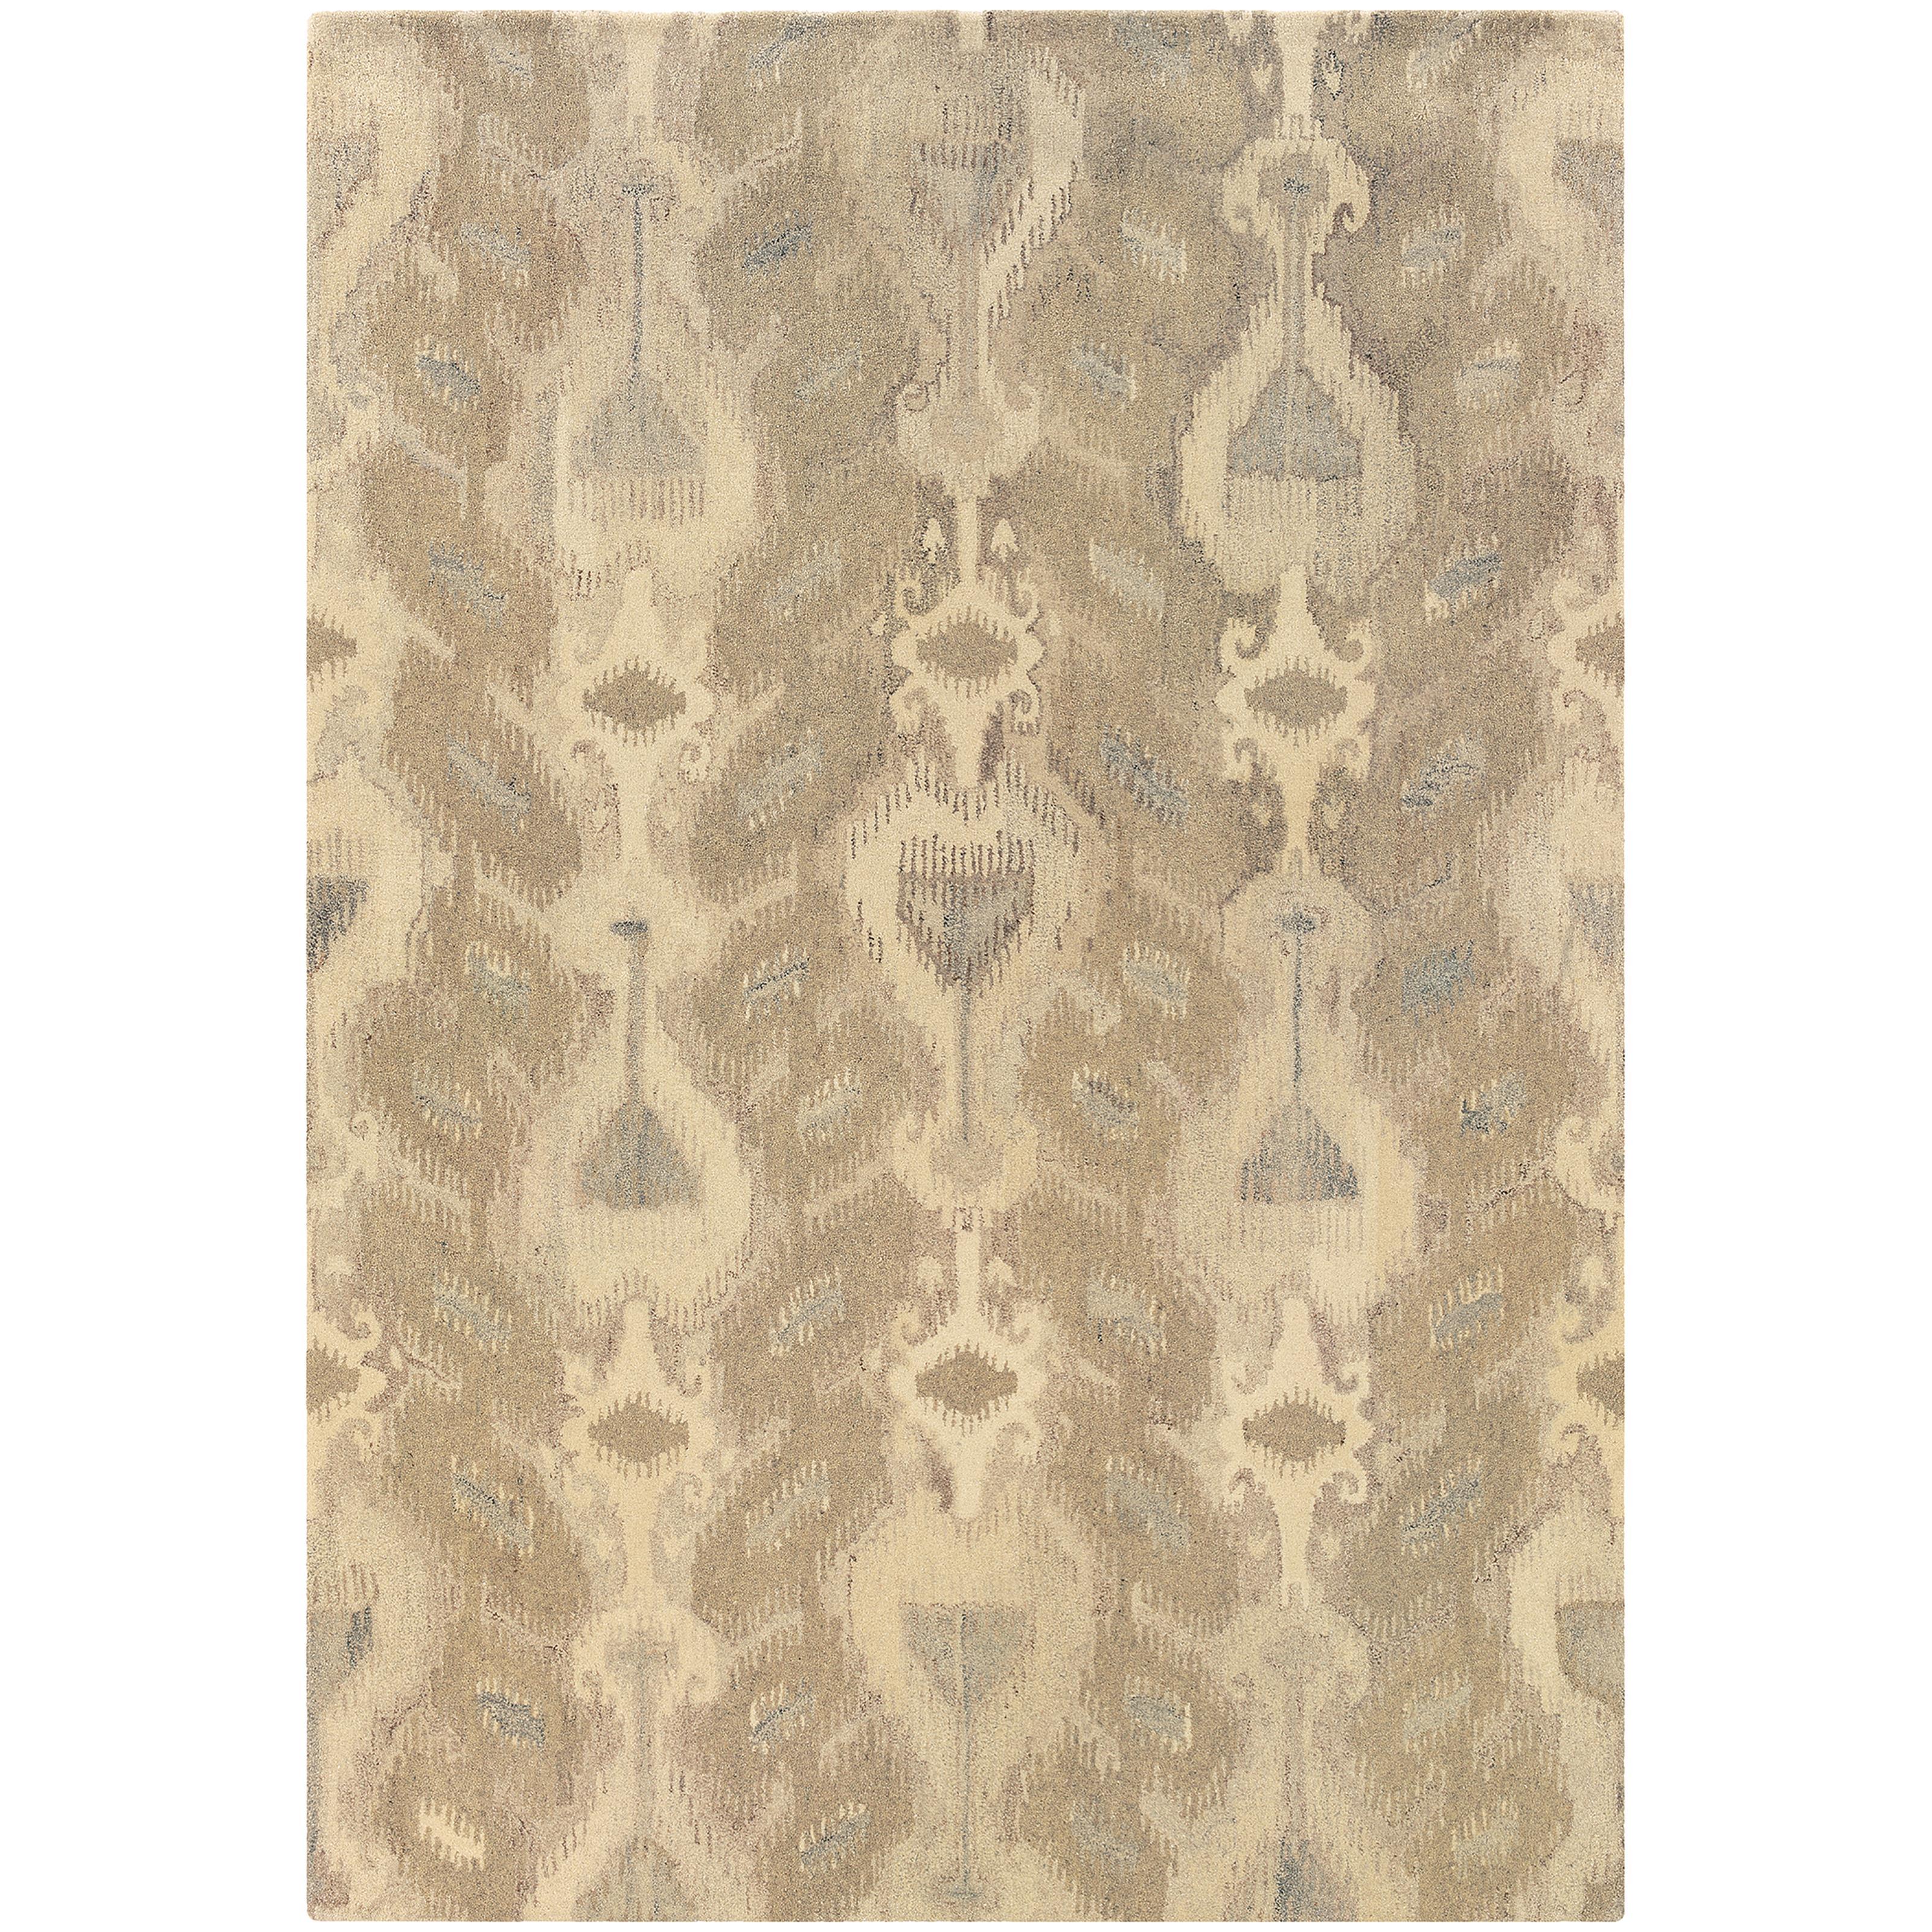 "Oriental Weavers Anastasia 10' 0"" X 13' 0"" Rug - Item Number: A68004305396ST"